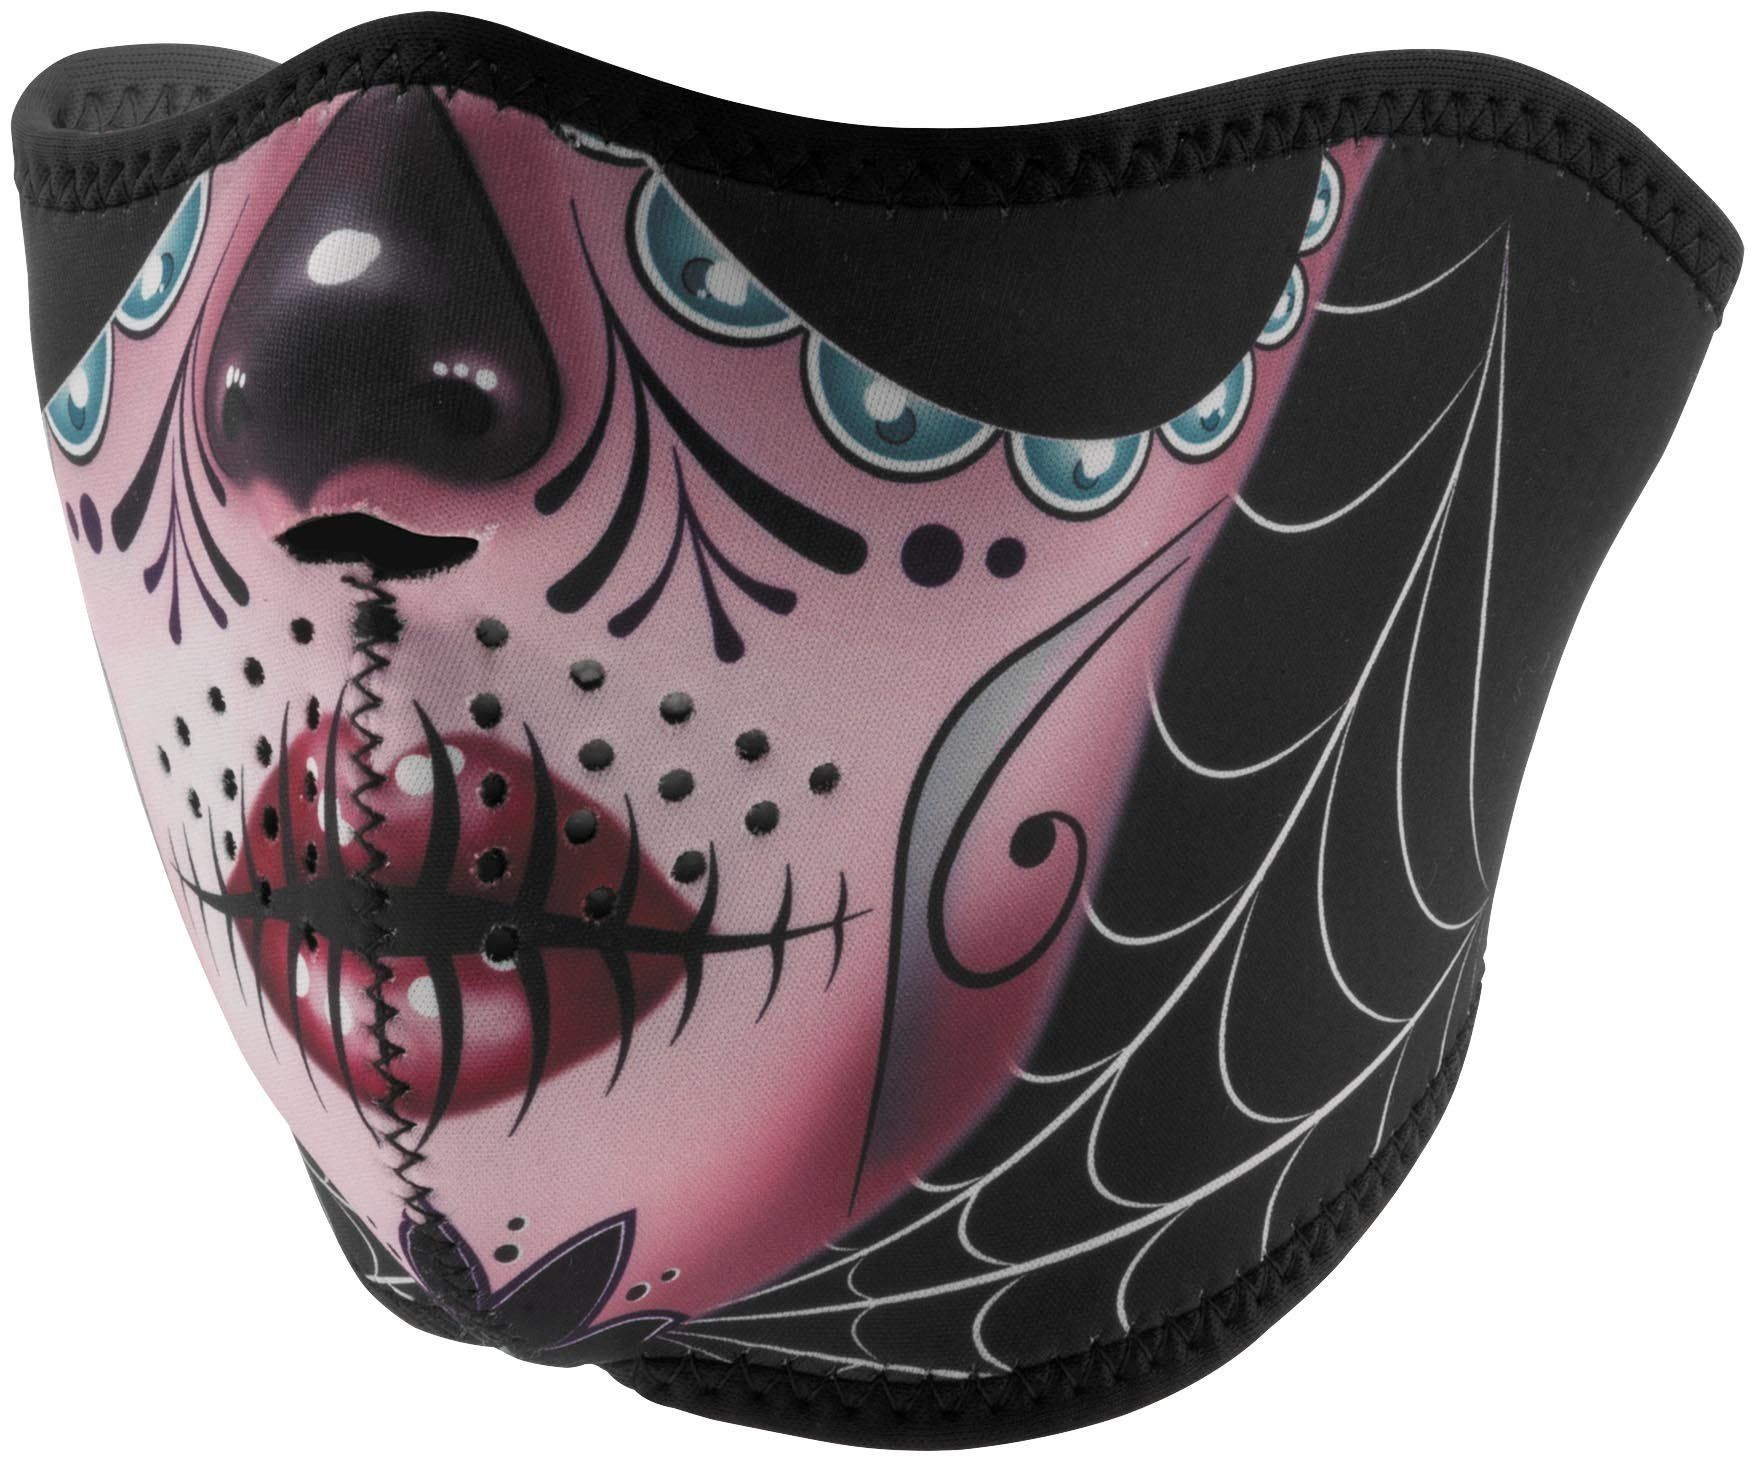 Zan Headgear Half Mask, Neoprene, Sugar Skull Reversible